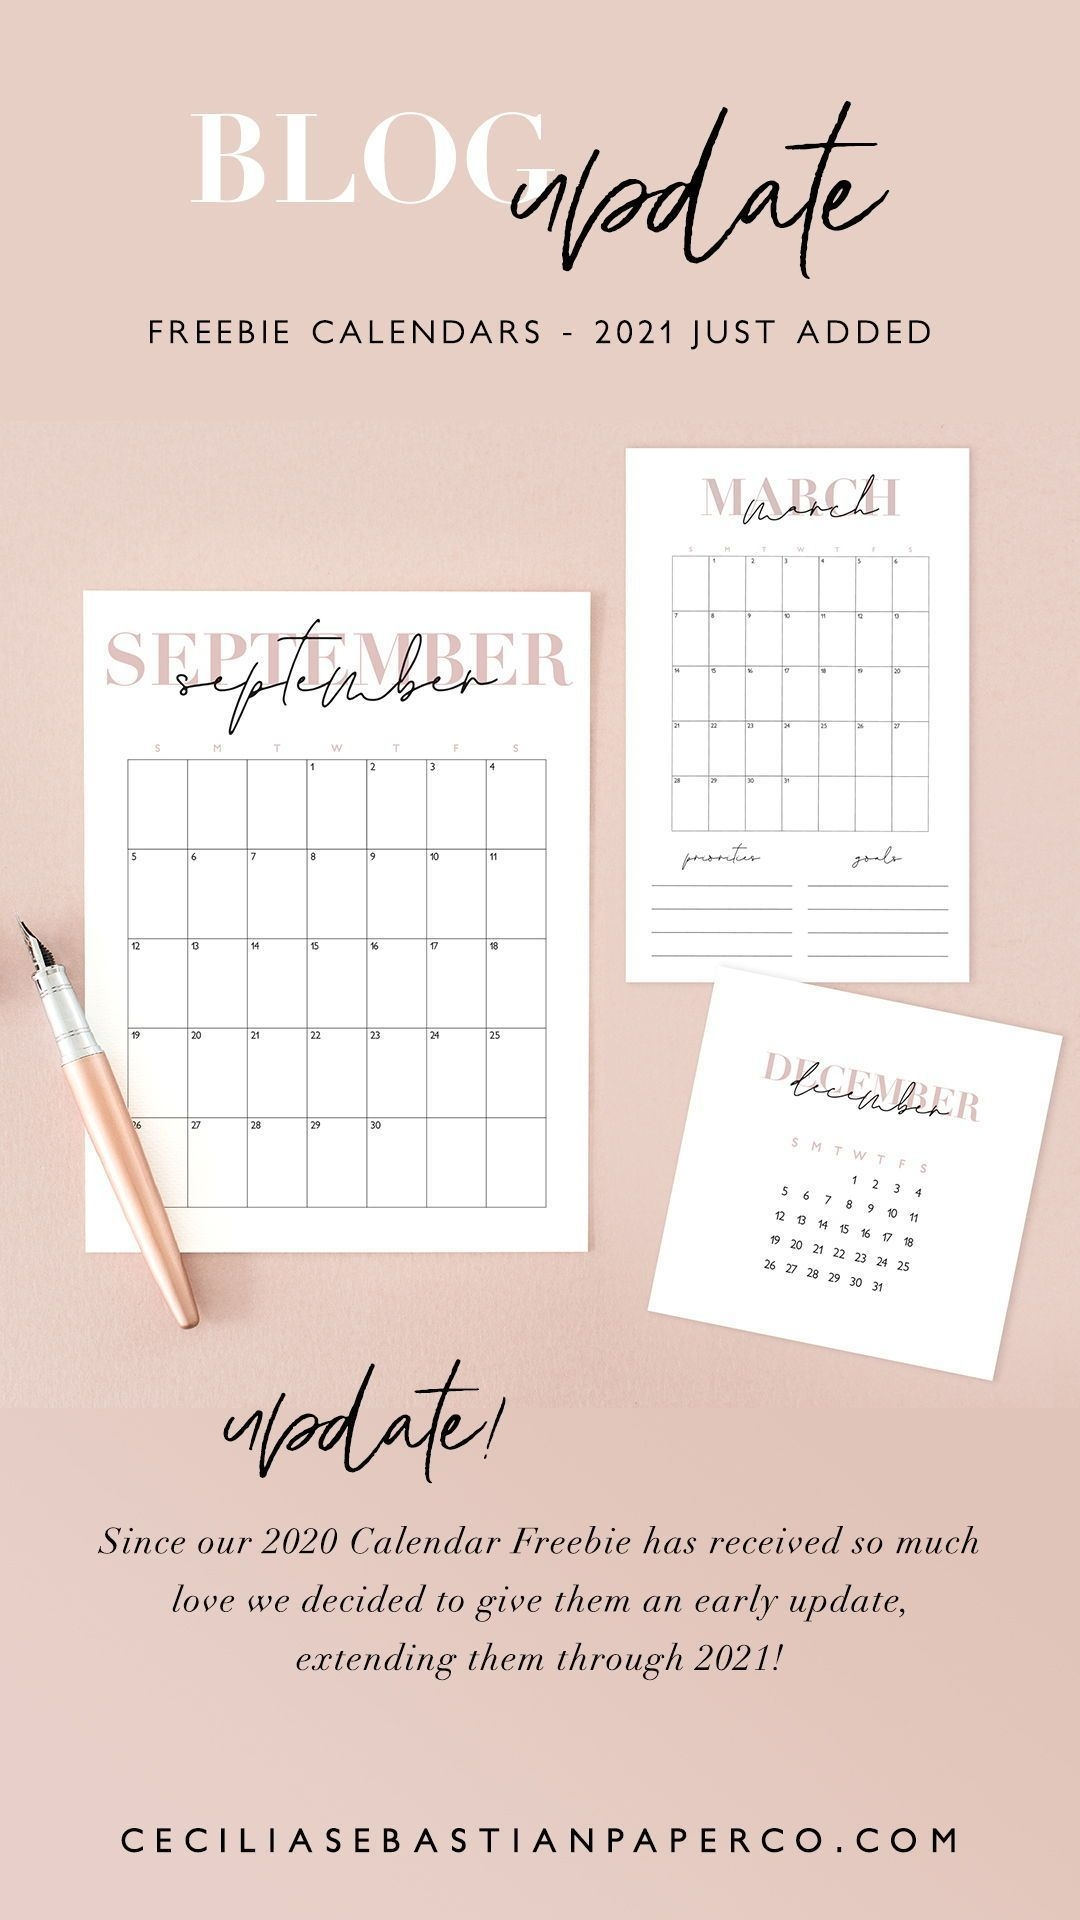 Freebie 2020 + 2021 Calendars | Ceciliasebastianpaperco